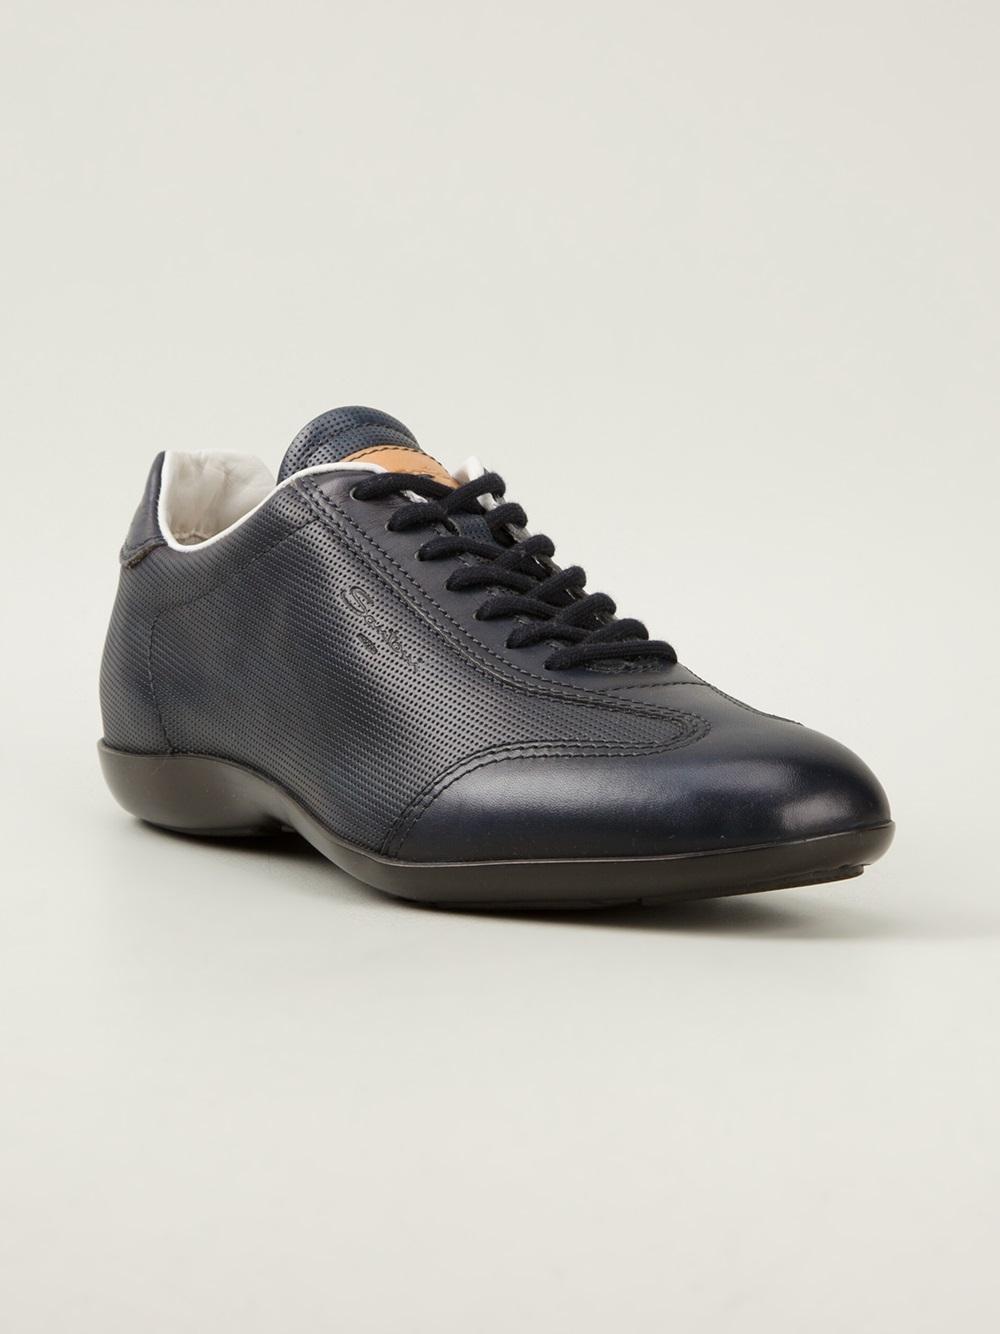 Santoni Women S Shoes